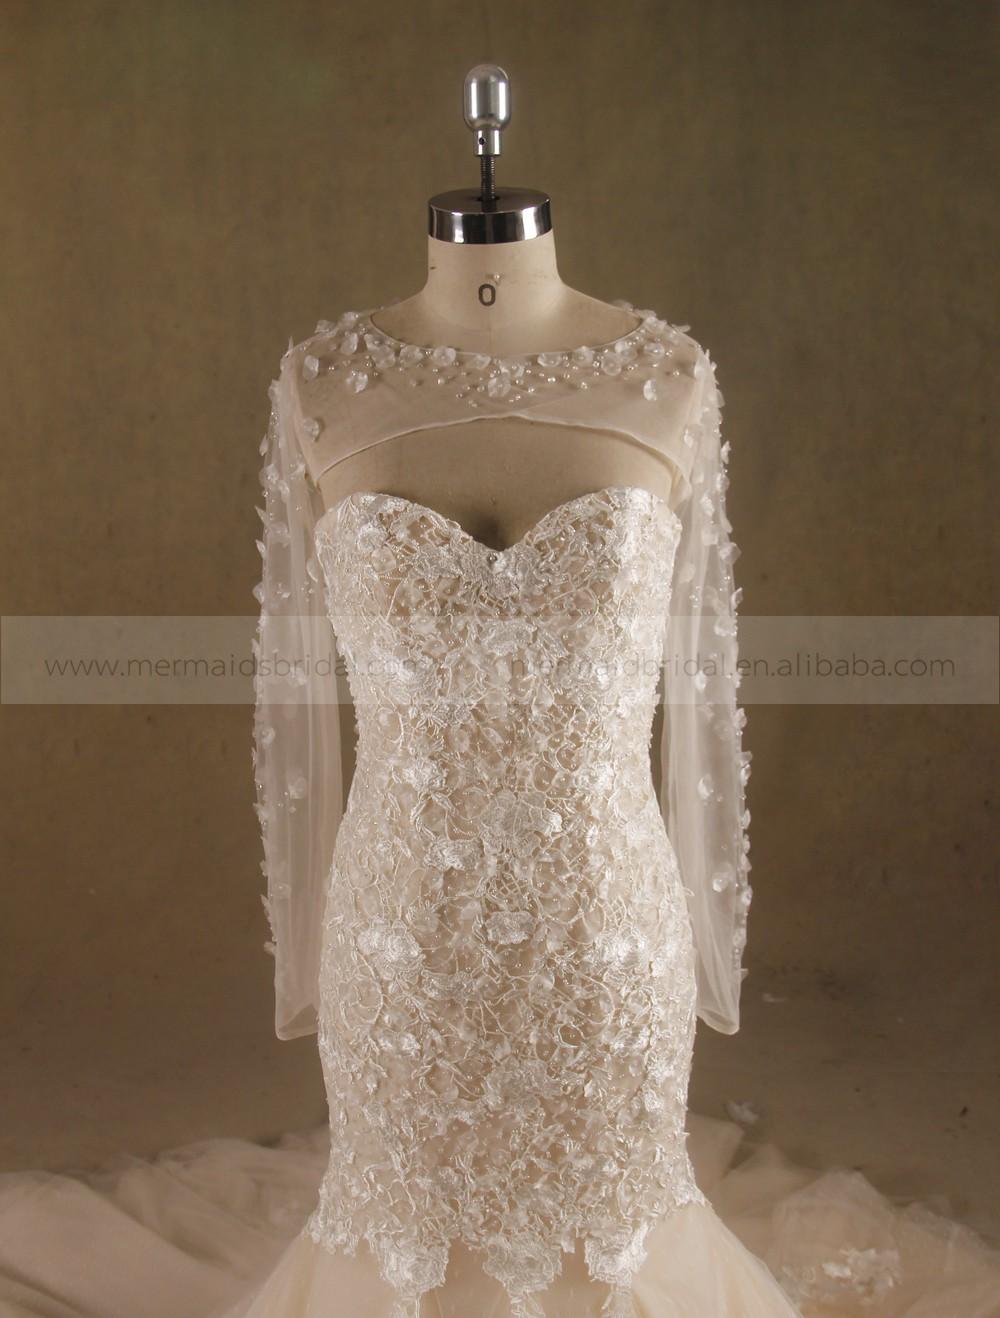 Fairy Heart Neck Mermaid Lace Handmade Flowers Wedding Dress Bottom